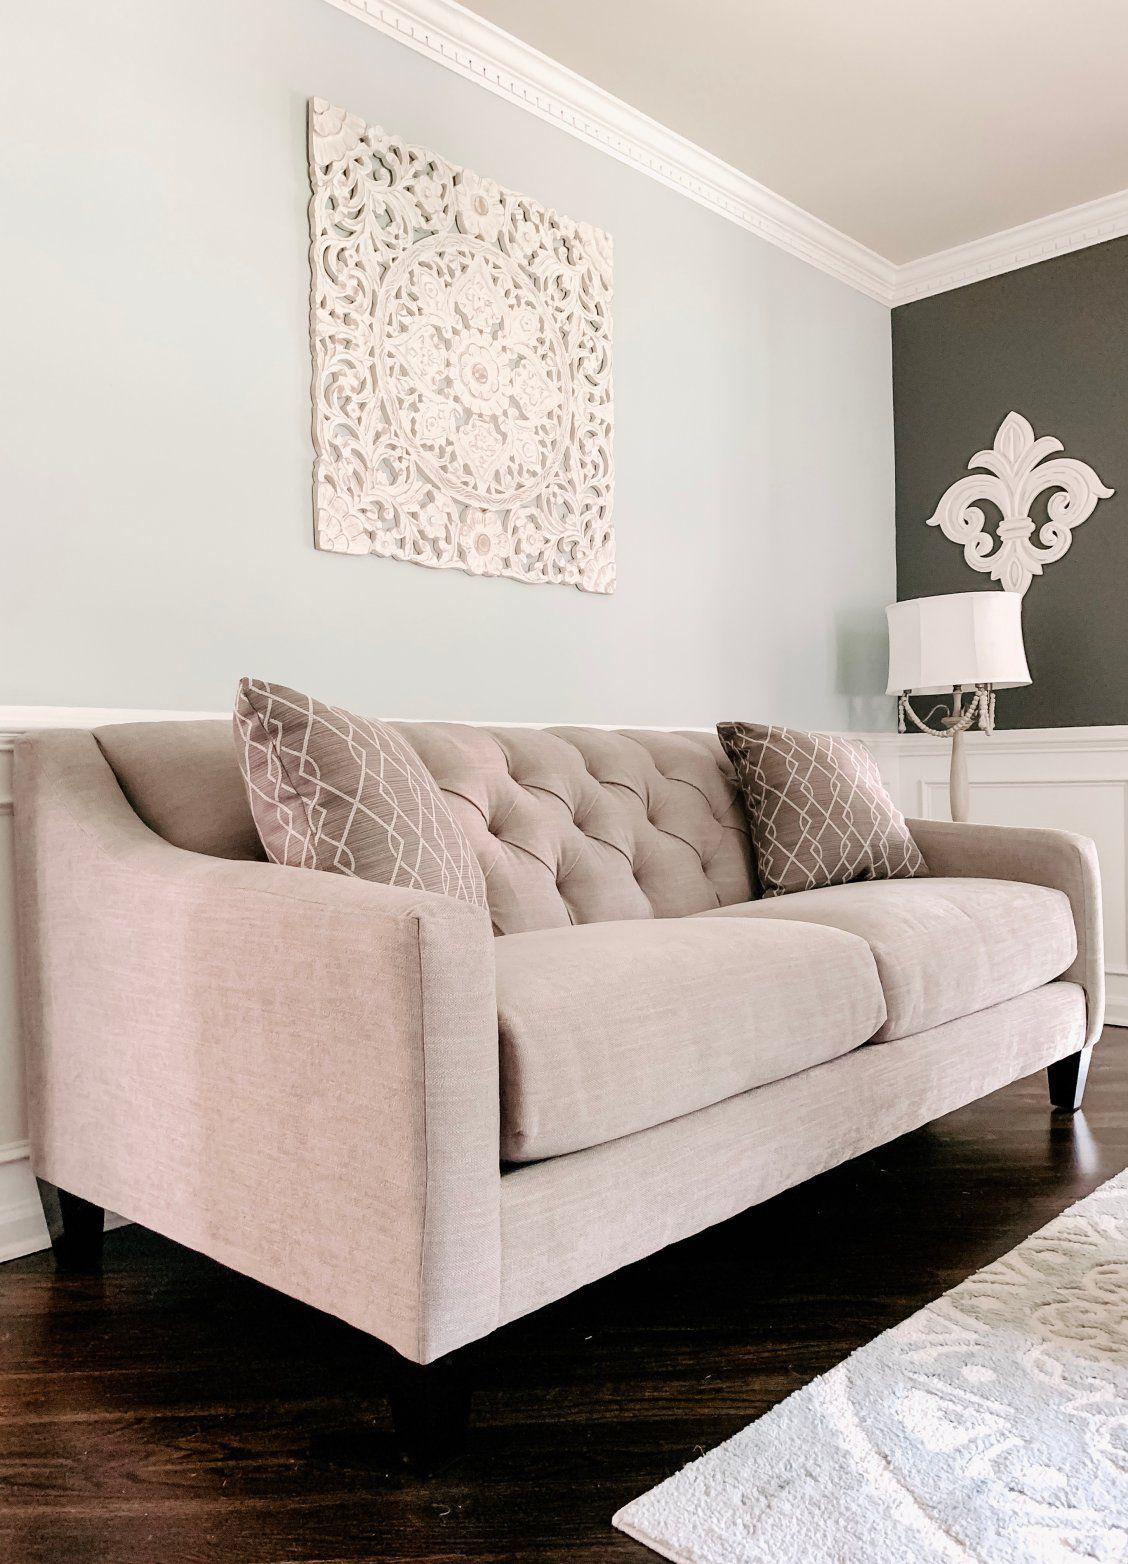 Densmore Sofa Light Grey Upholstery Sofa Neutral Living Room